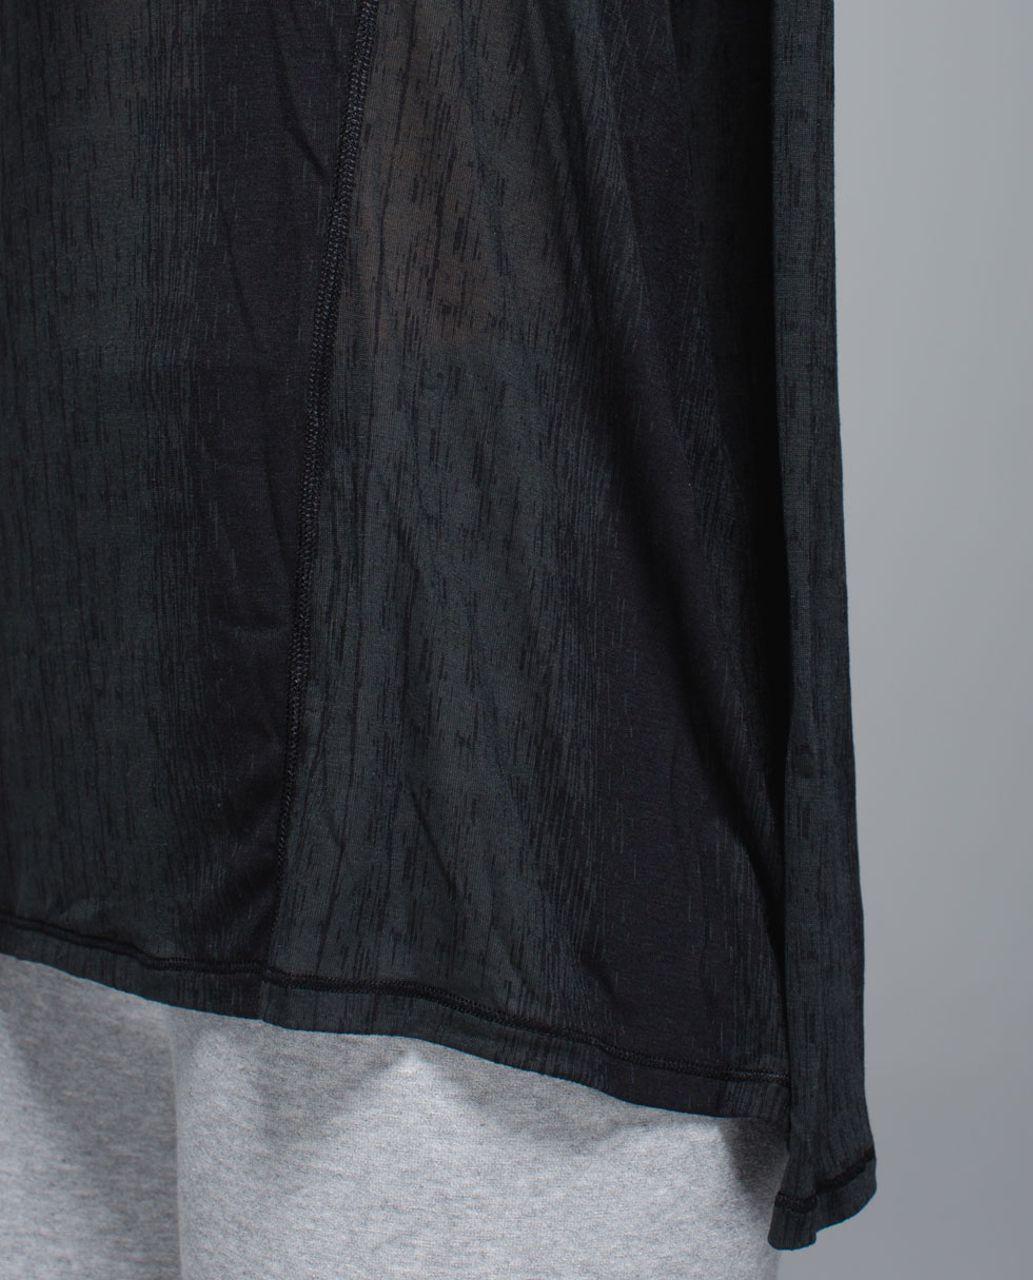 Lululemon Salutation To Savasana Tank - Misty Stripe Burnout Black